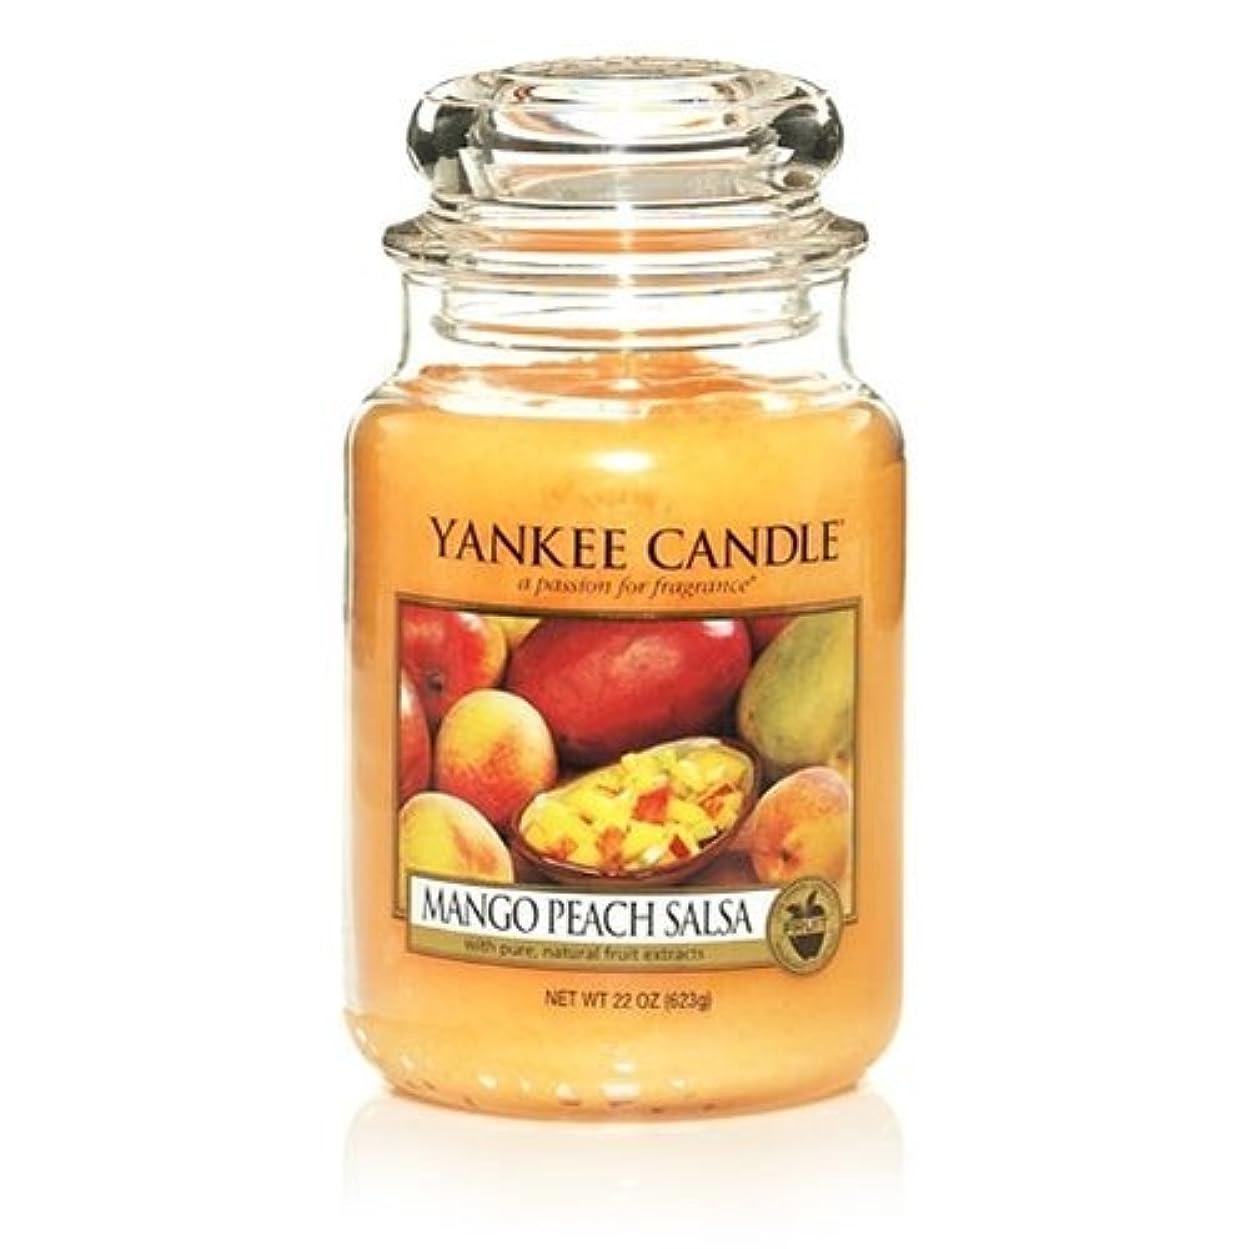 乳剤出口努力Yankee Candle 22-Ounce Jar Scented Candle, Large, Mango Peach Salsa [並行輸入品]